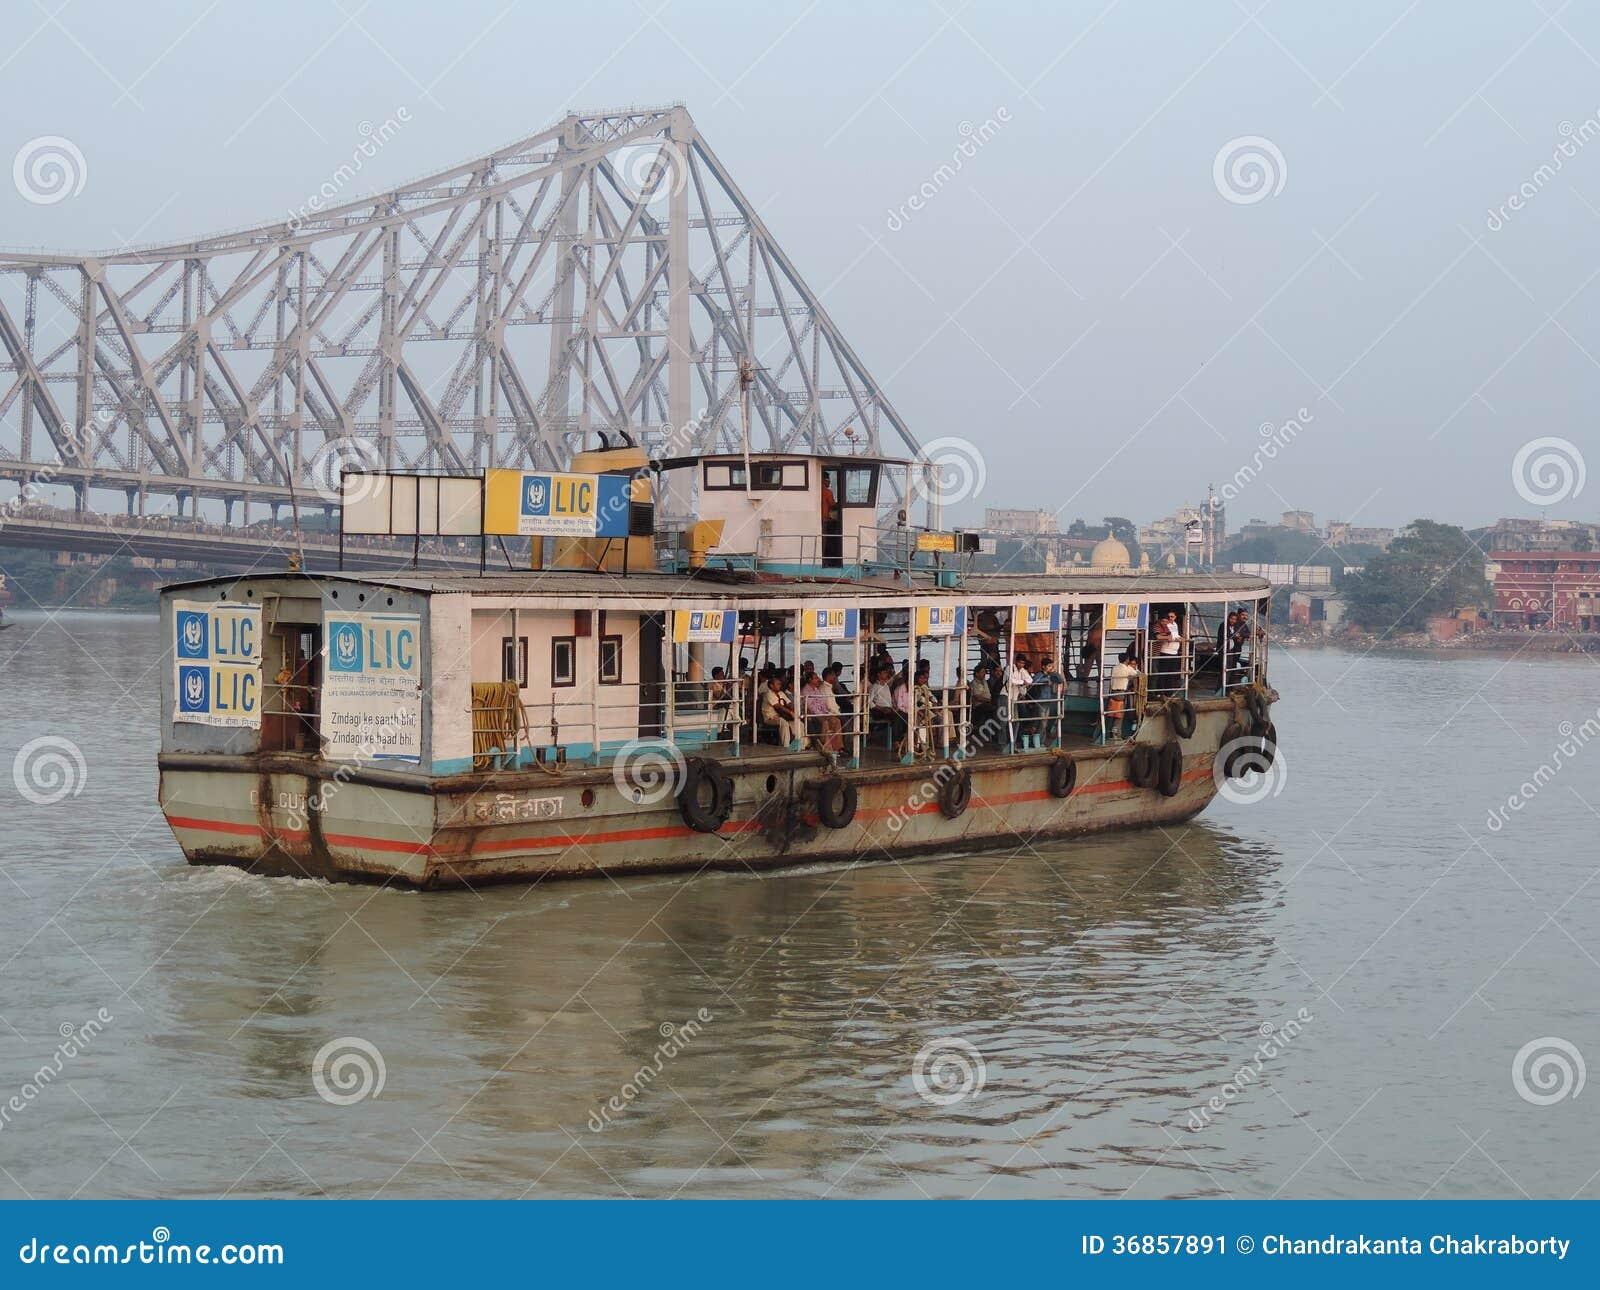 Howrah Bridge And Kolkata Boat Transport Editorial Photo - Image: 36857891